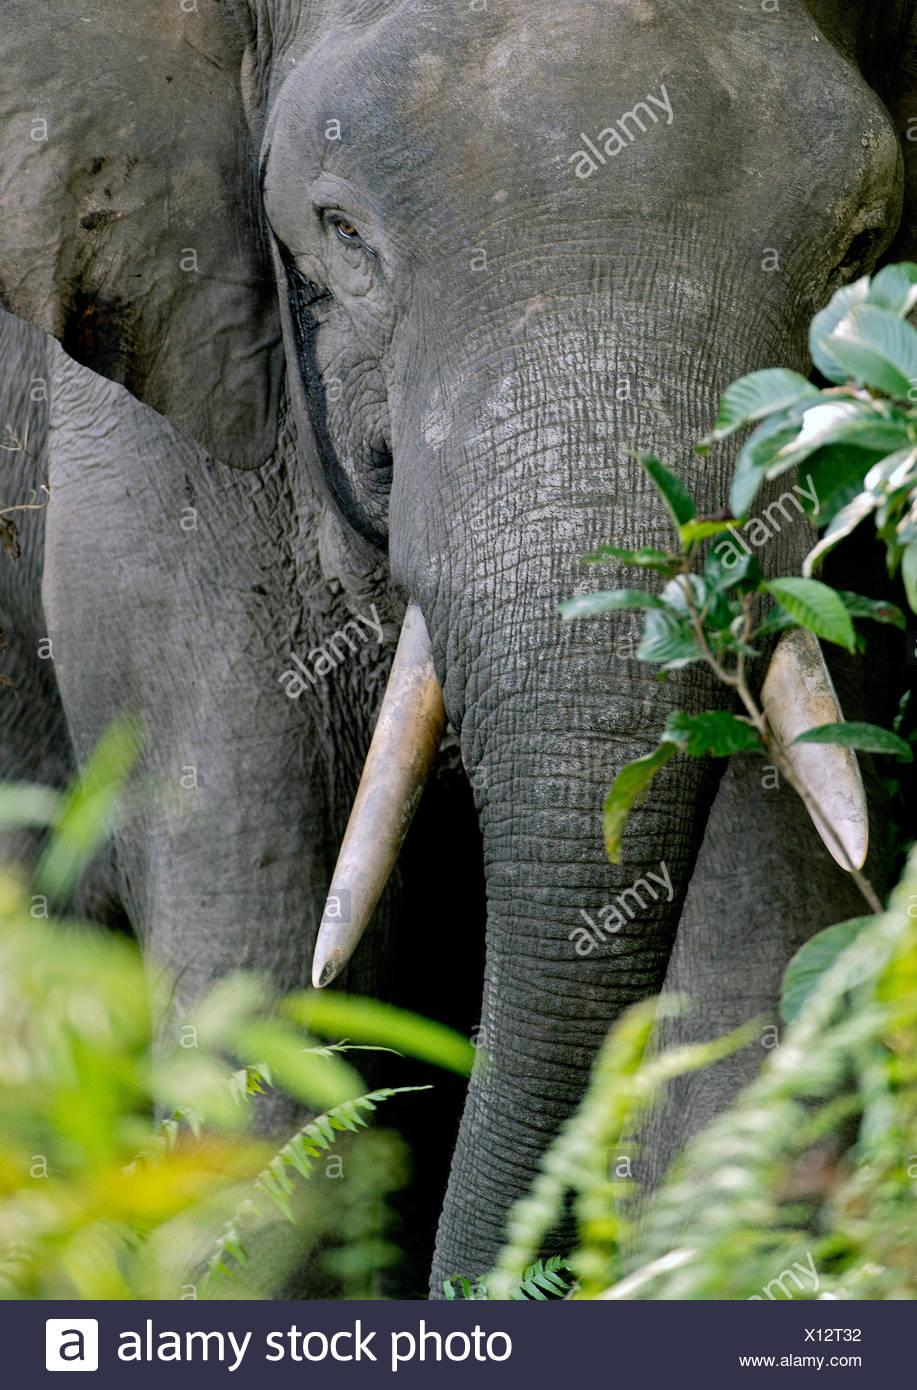 Bornes Dwarf Elephant (Elephas maximus borneensis), portrait, Malaysia, Borneo, Sabah, Kinabatangan River - Stock Image